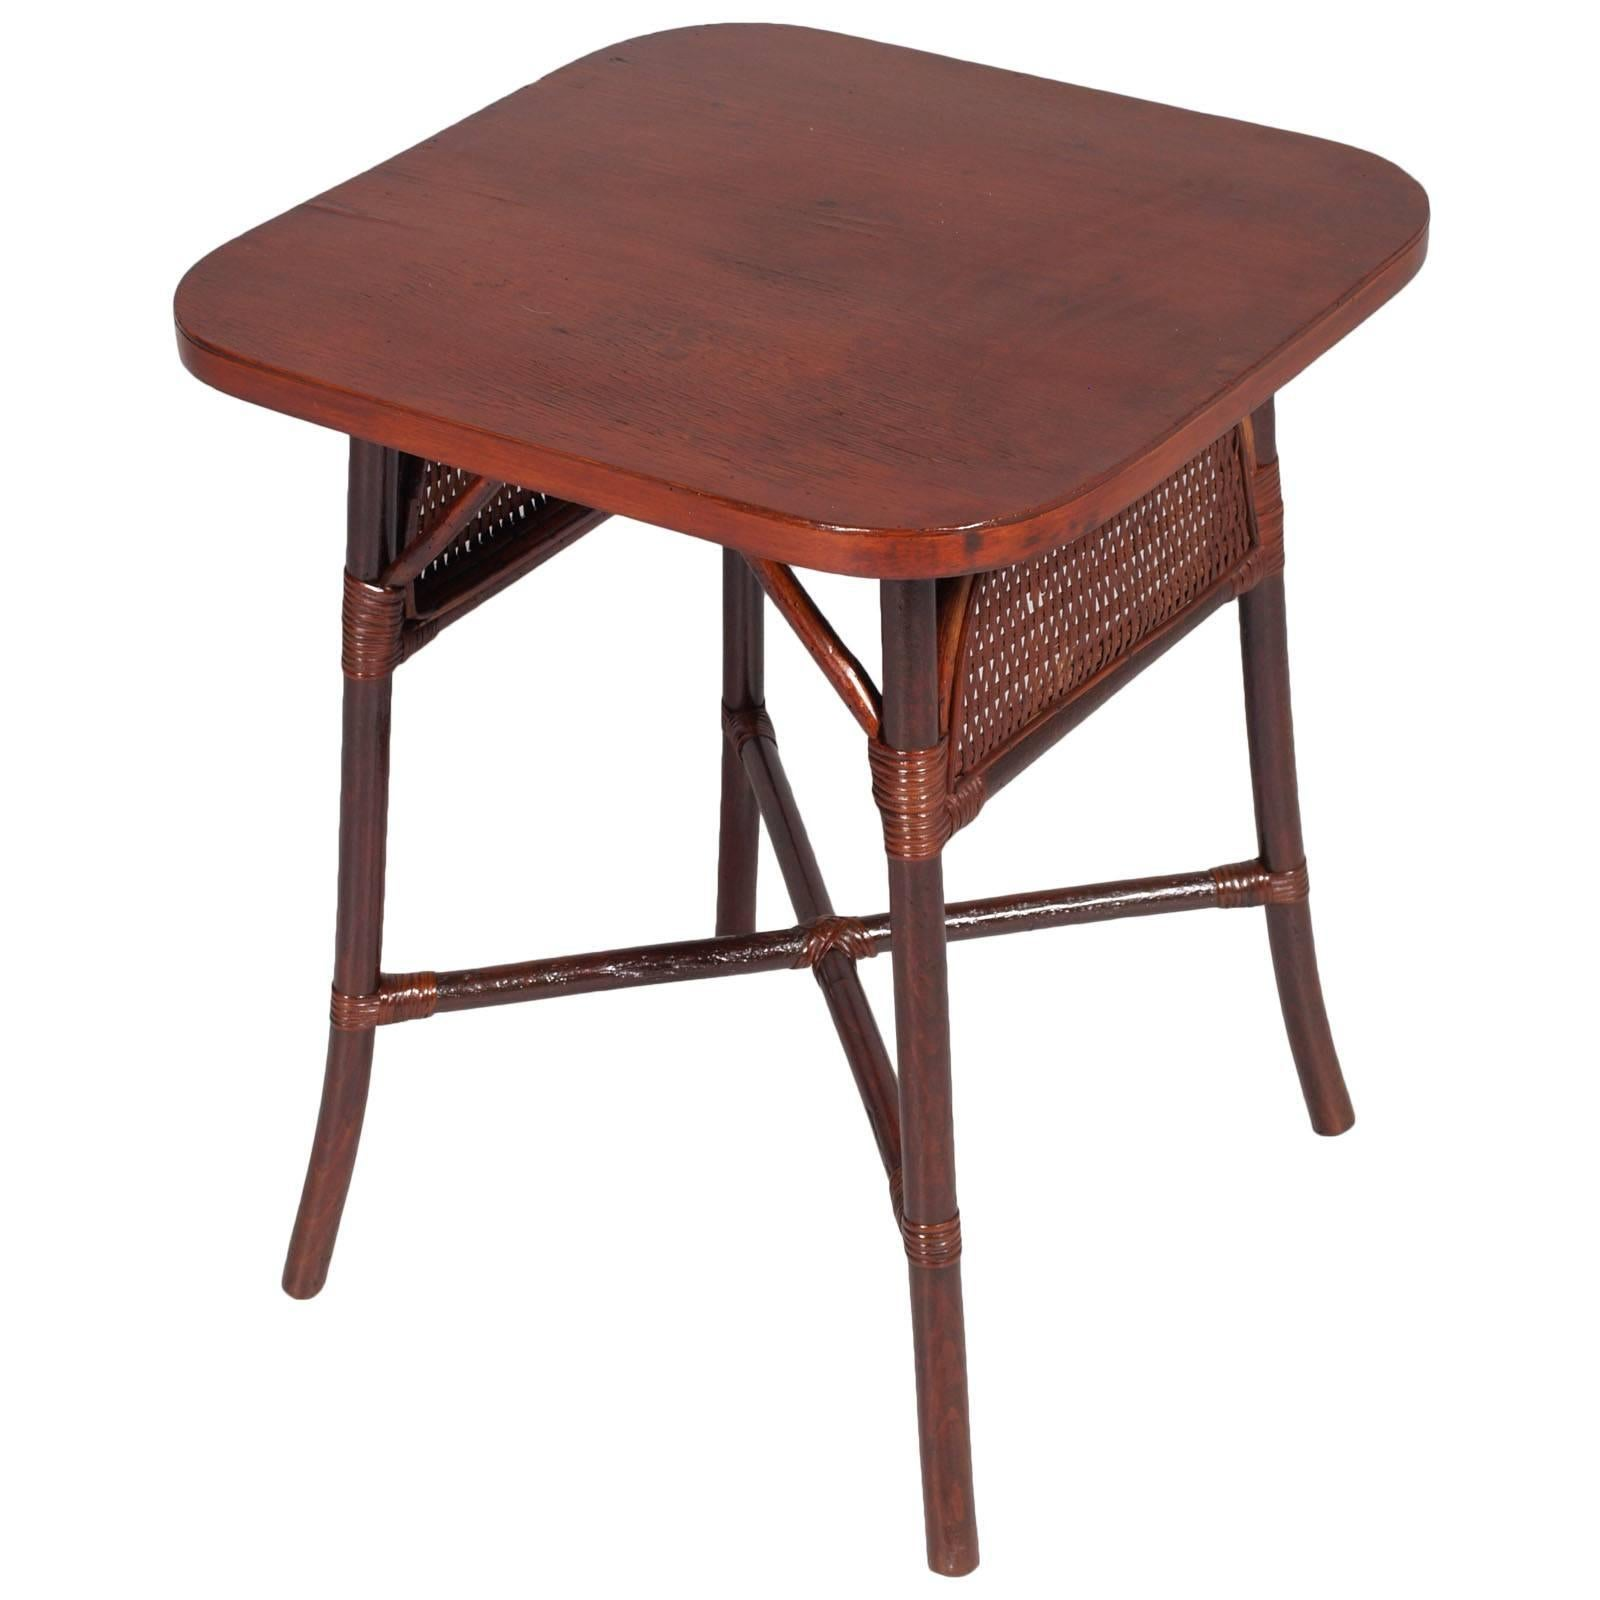 Italian Art Deco Chinoiserie 1920s Side Table in Walnut Raffia Top Mahogany Slab